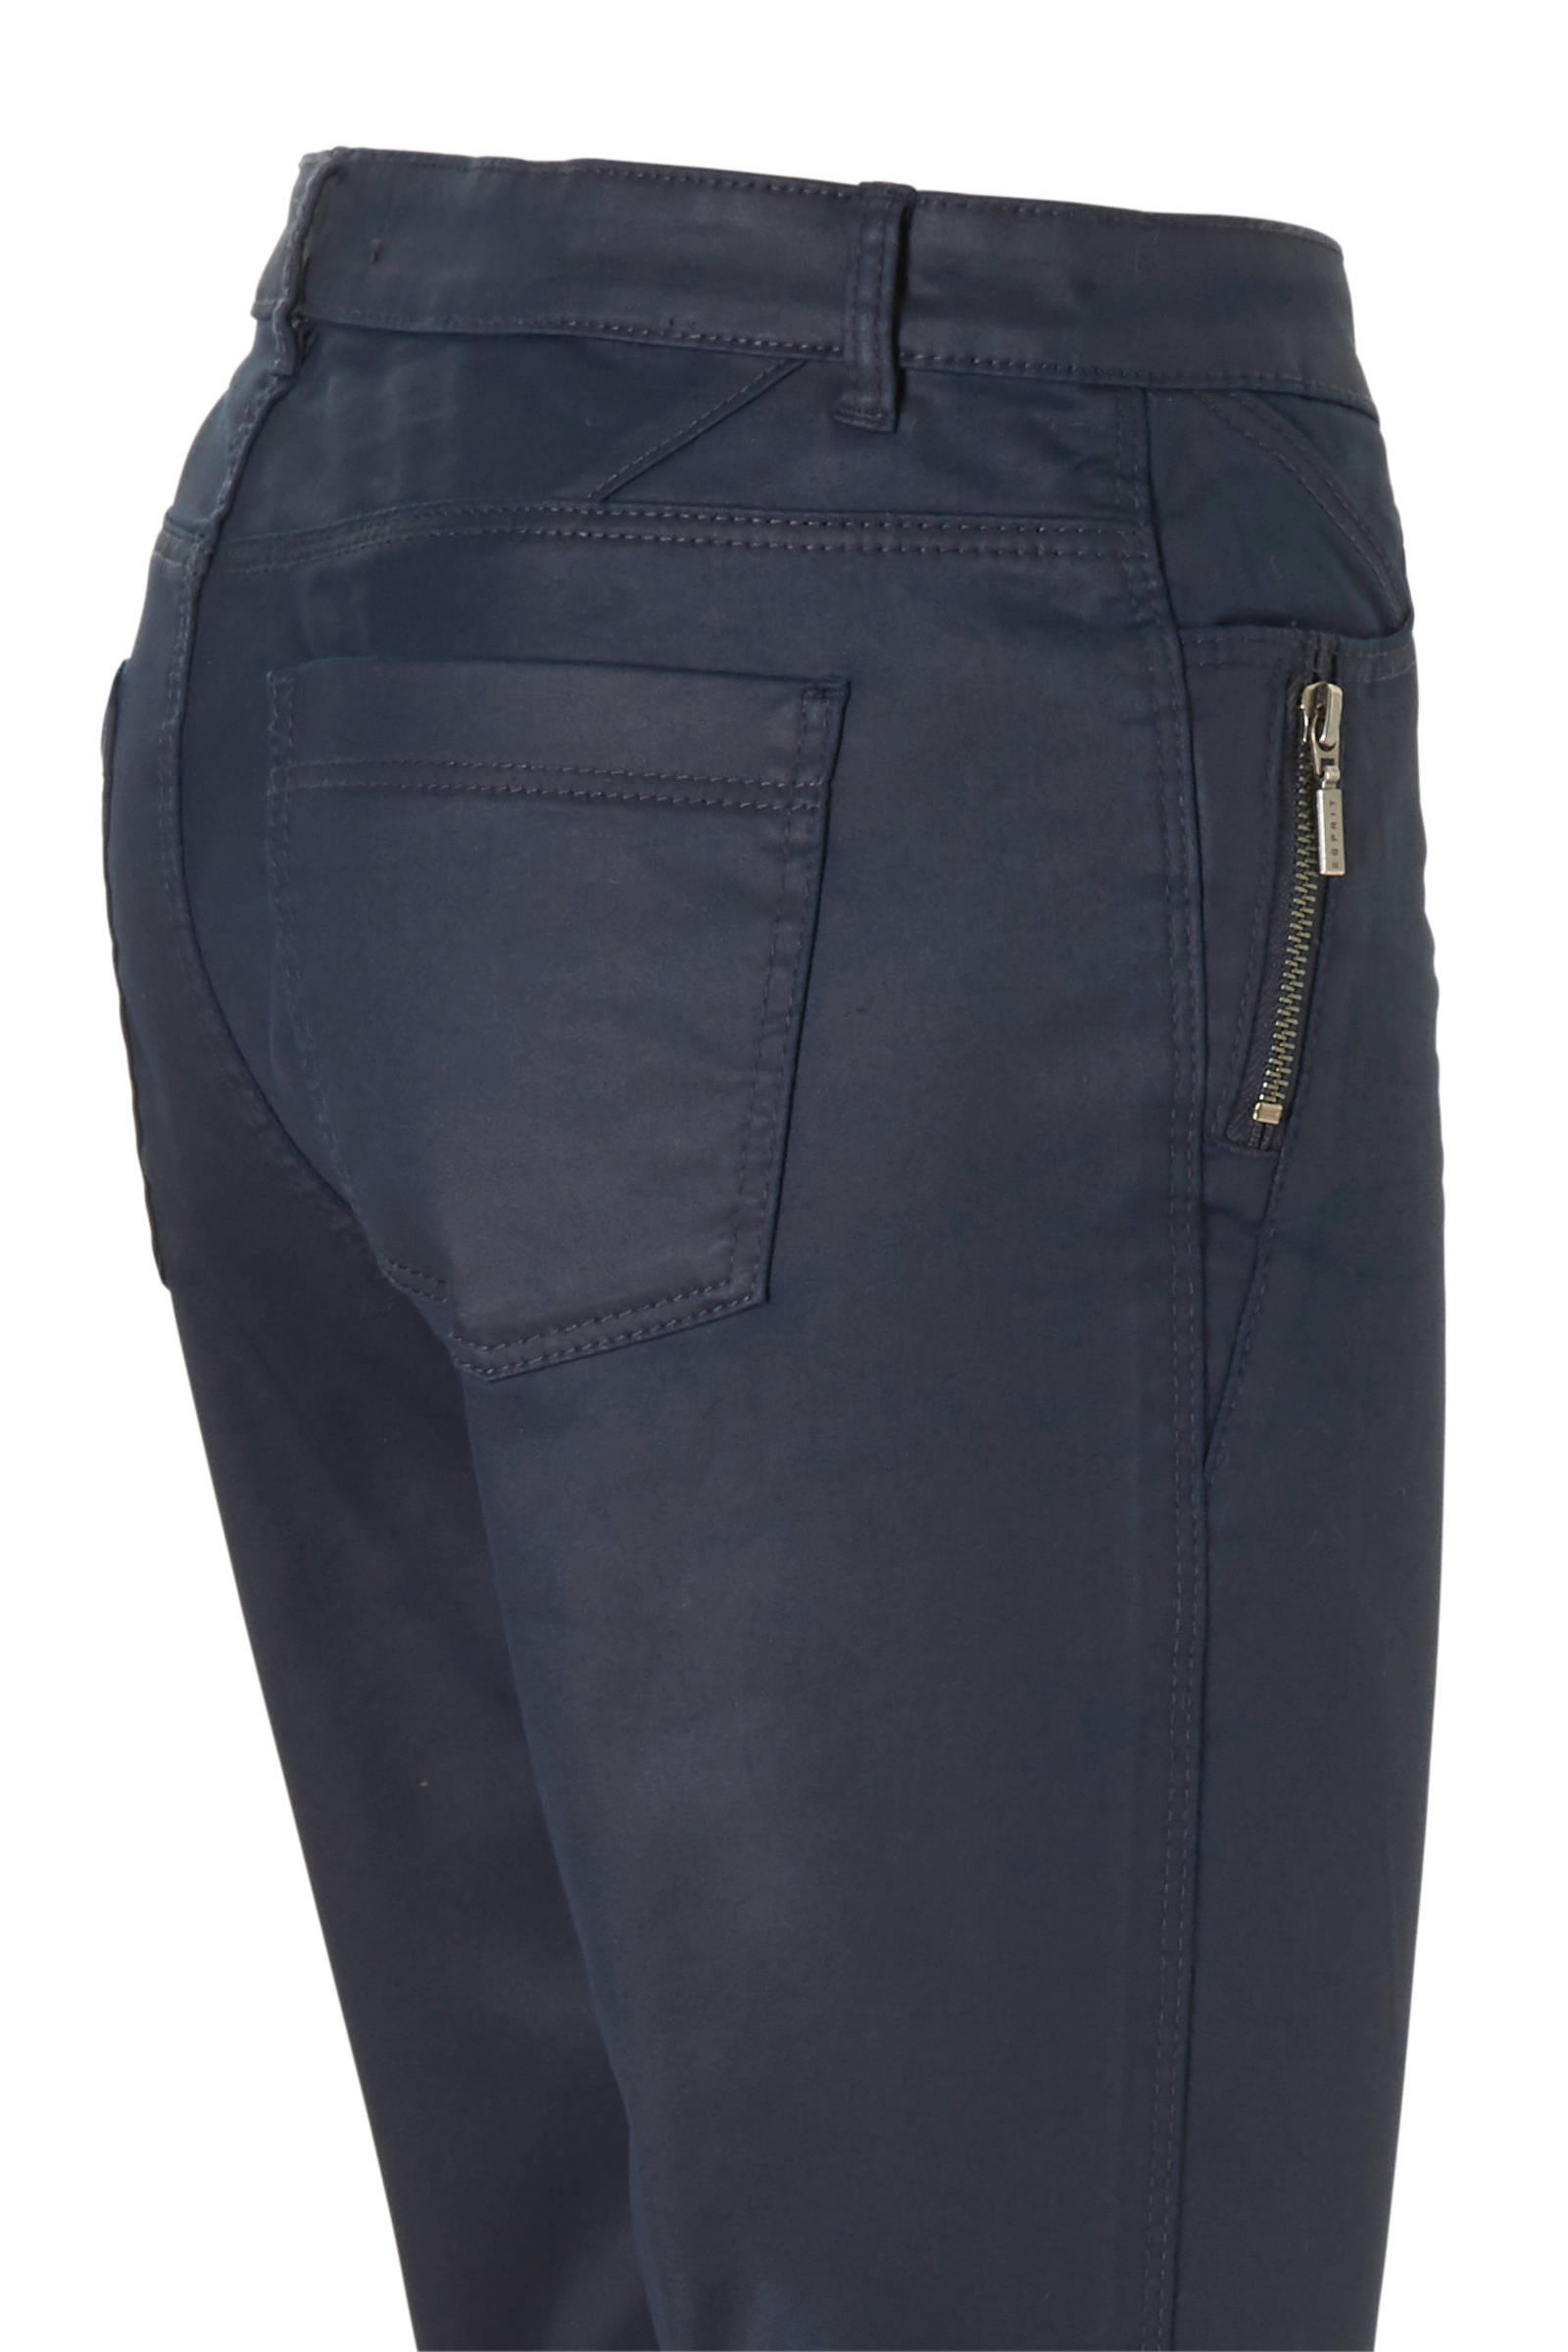 Casual fit met Women ESPRIT coating broek skinny twS5Cq